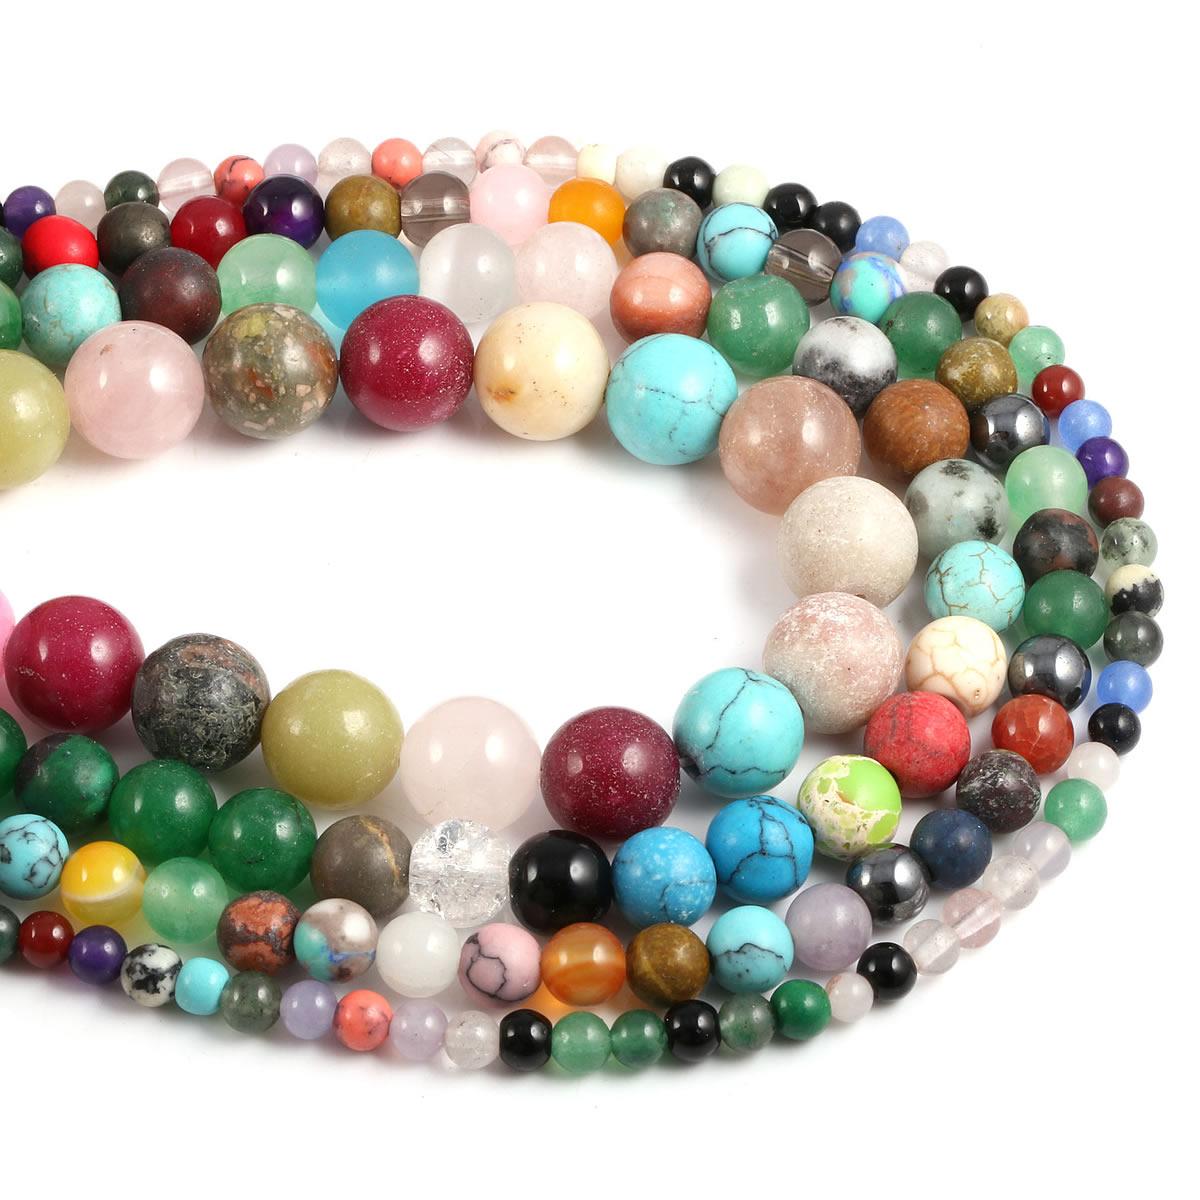 Natural Stone Beading Mixed color beads Round Loose BeadsIsolation beads  for DIY Elegant Necklace Bracelet Jewelry Making